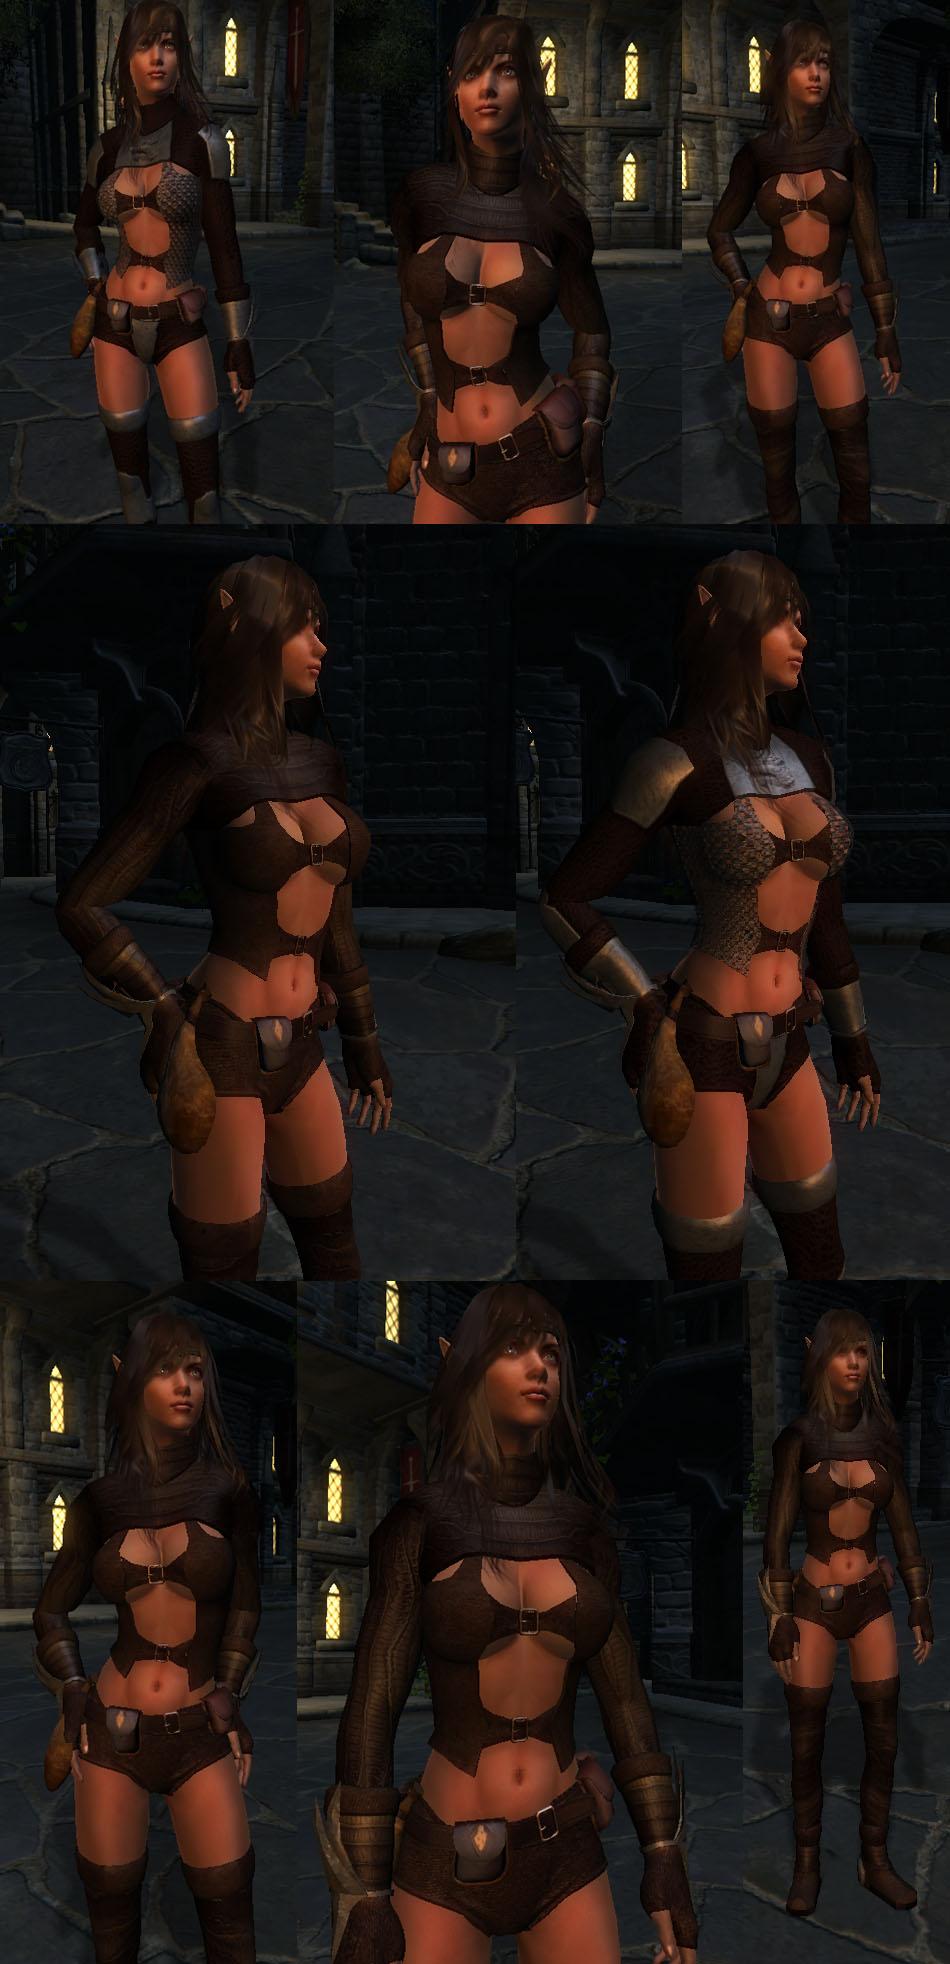 Elderscrolls henti softcore photo